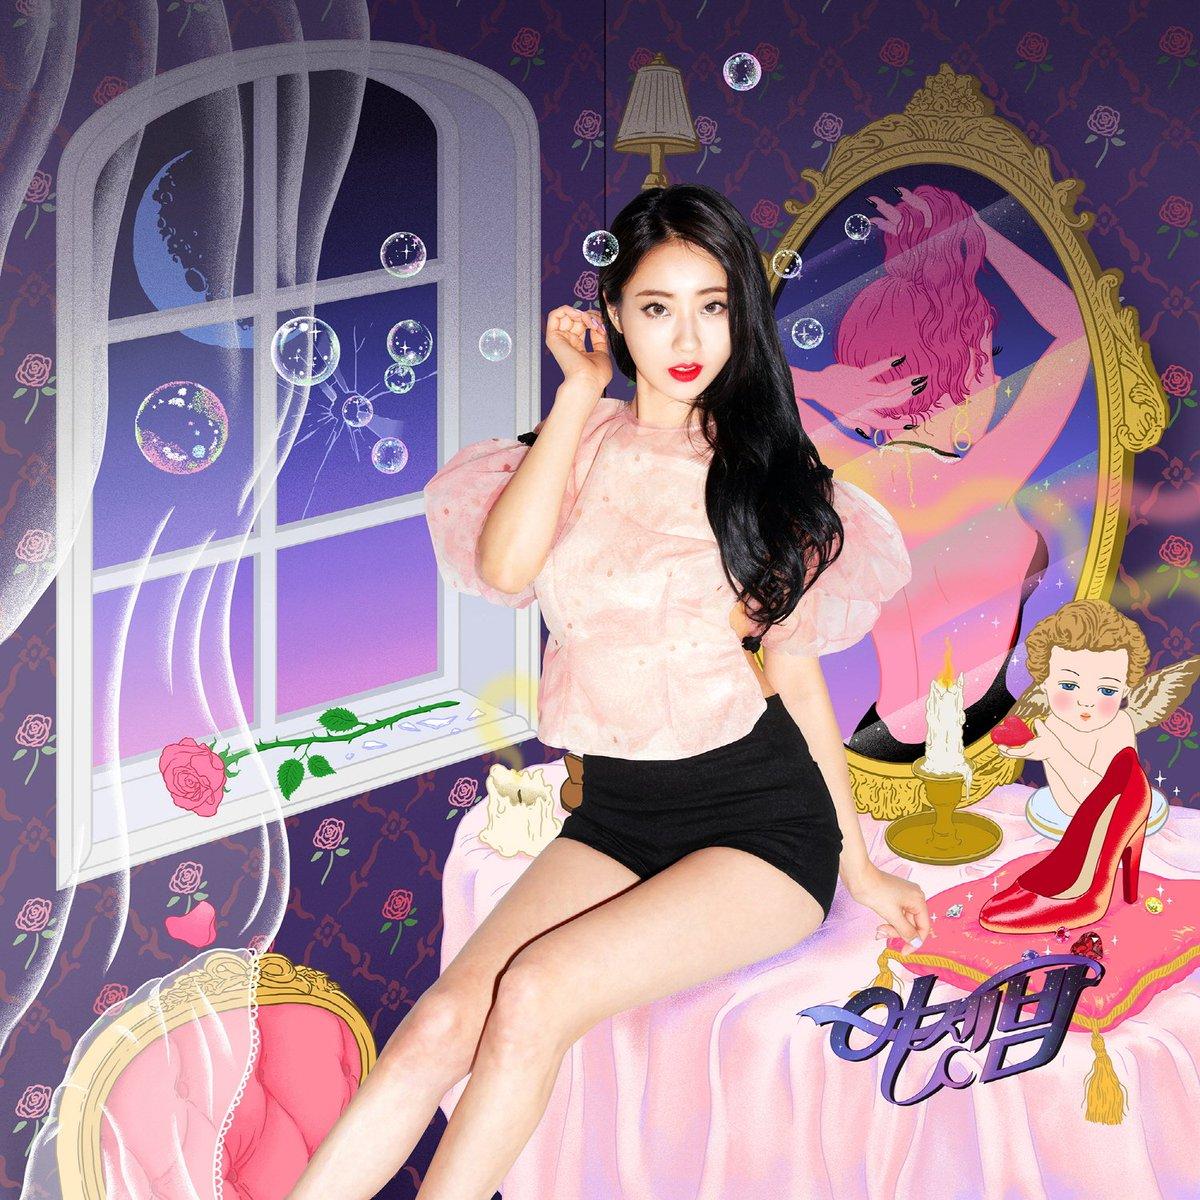 [Actualizado] Kyungri de 9MUSES comparte miniatura de álbum para sencillo debut